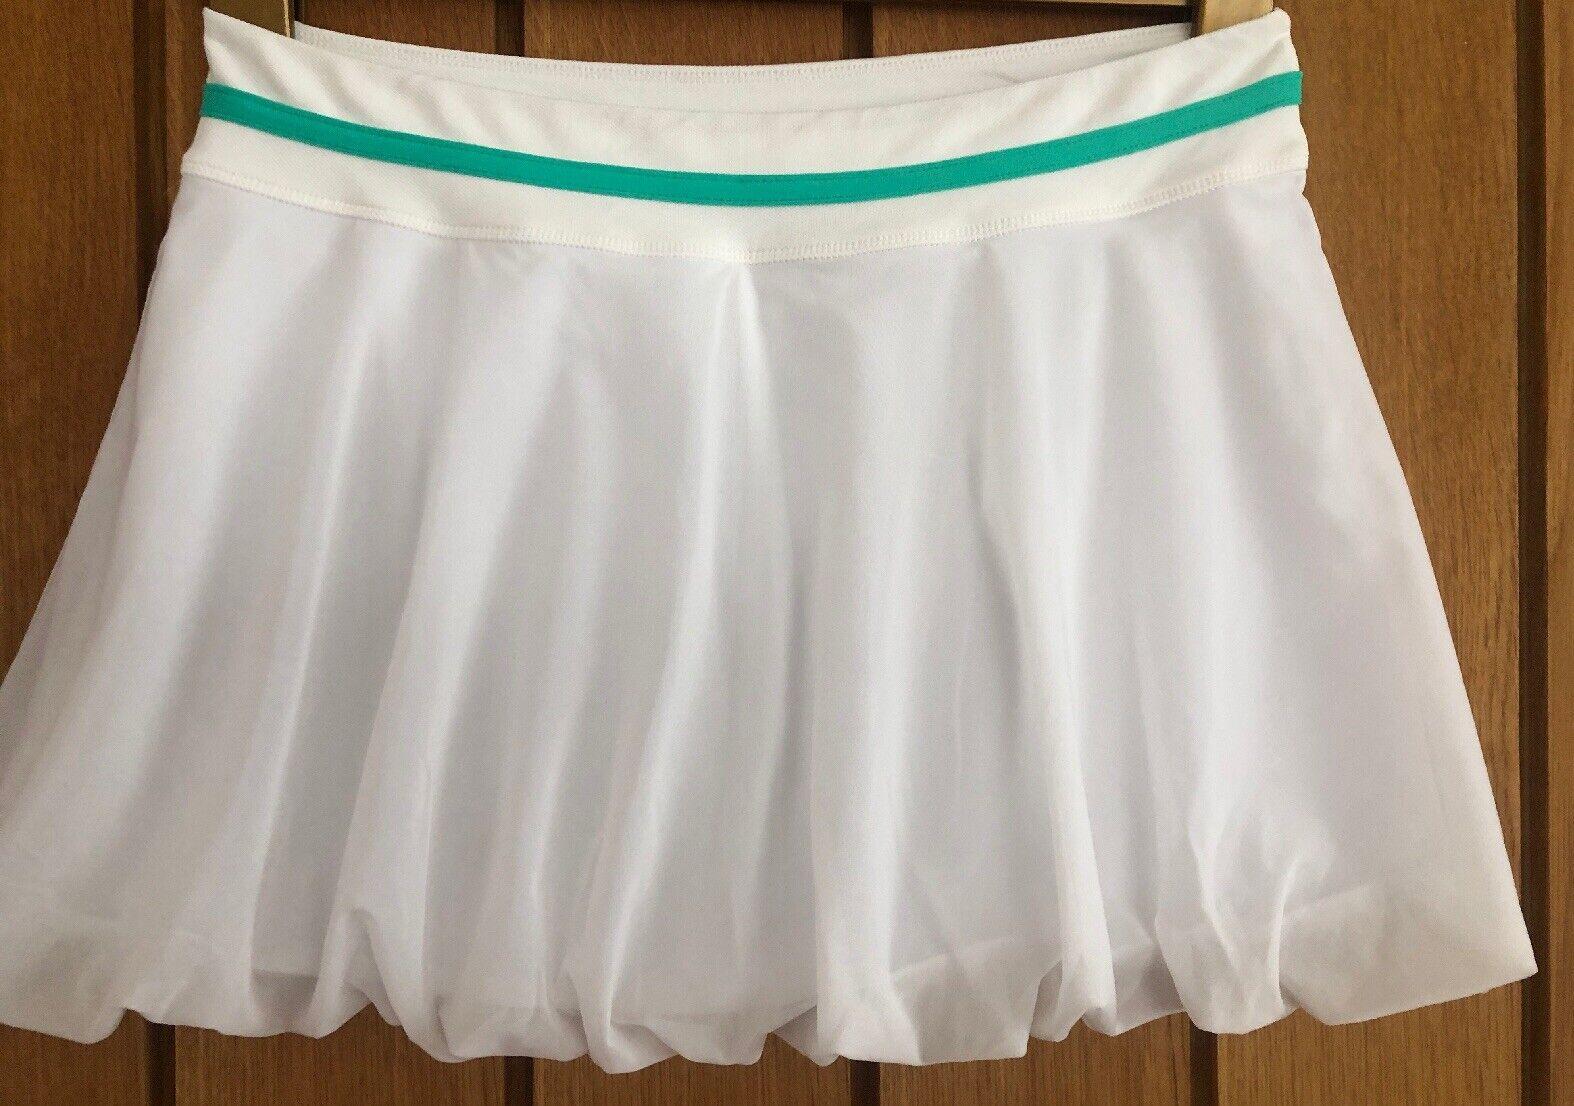 BNWT- SWEATY BETTY White 'Match Play' Tennis Skort. Size Small. RRP